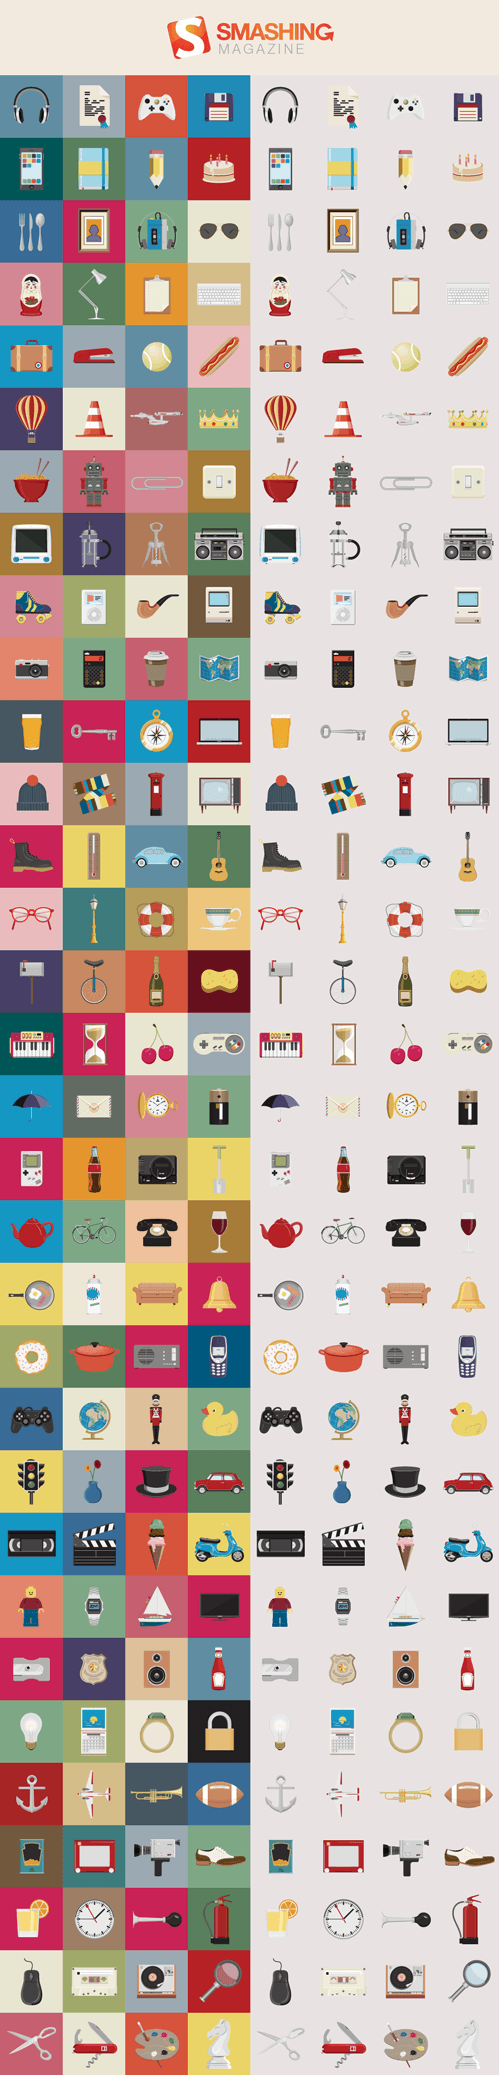 Freebie: Nice Things Icon Set (128 Icons, PNG + AI Source) by Chris Behr on Smashing Magazine